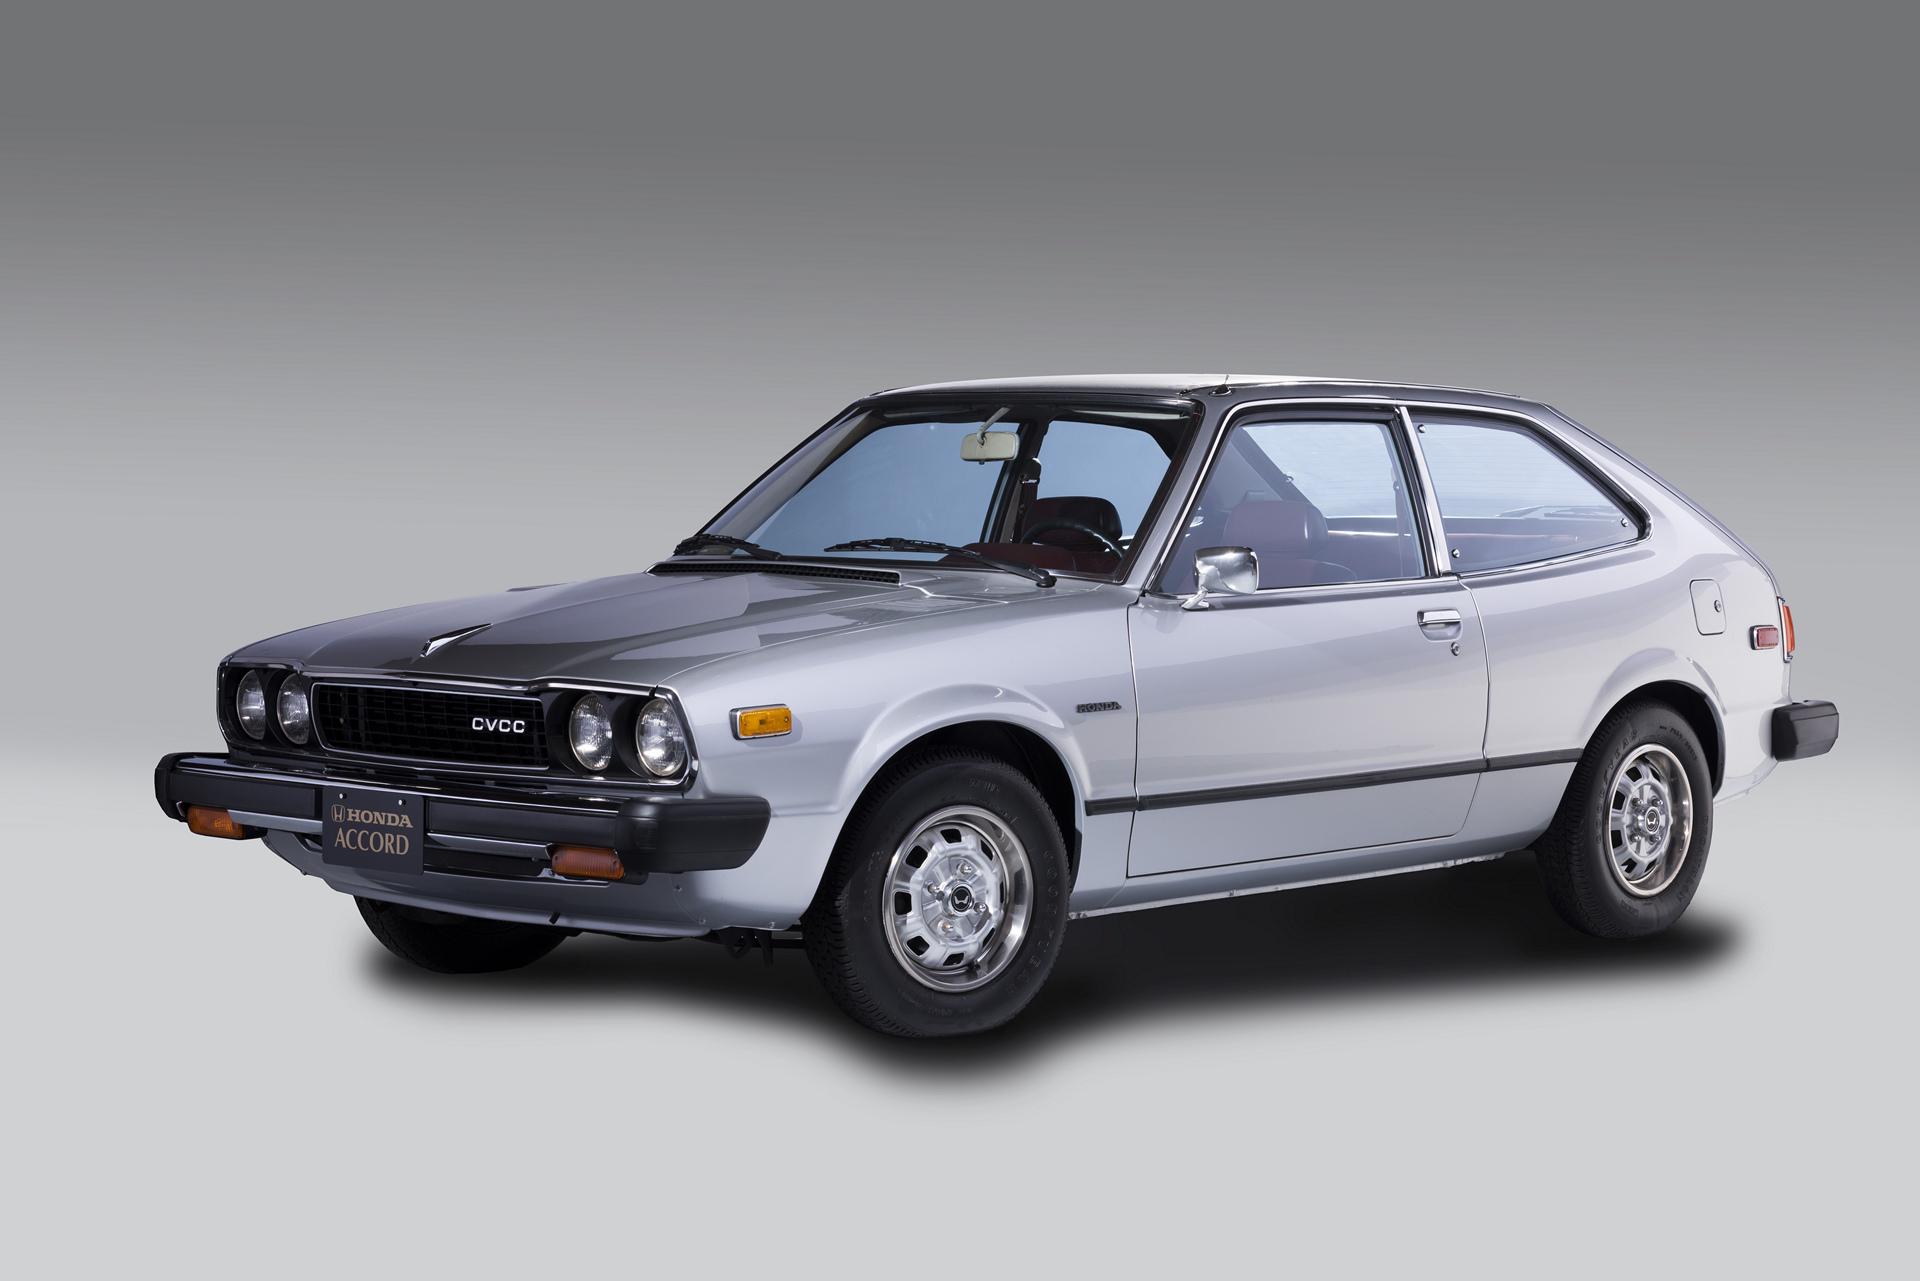 First-Generation 1976 Honda Accord © Honda Motor Co., Ltd.